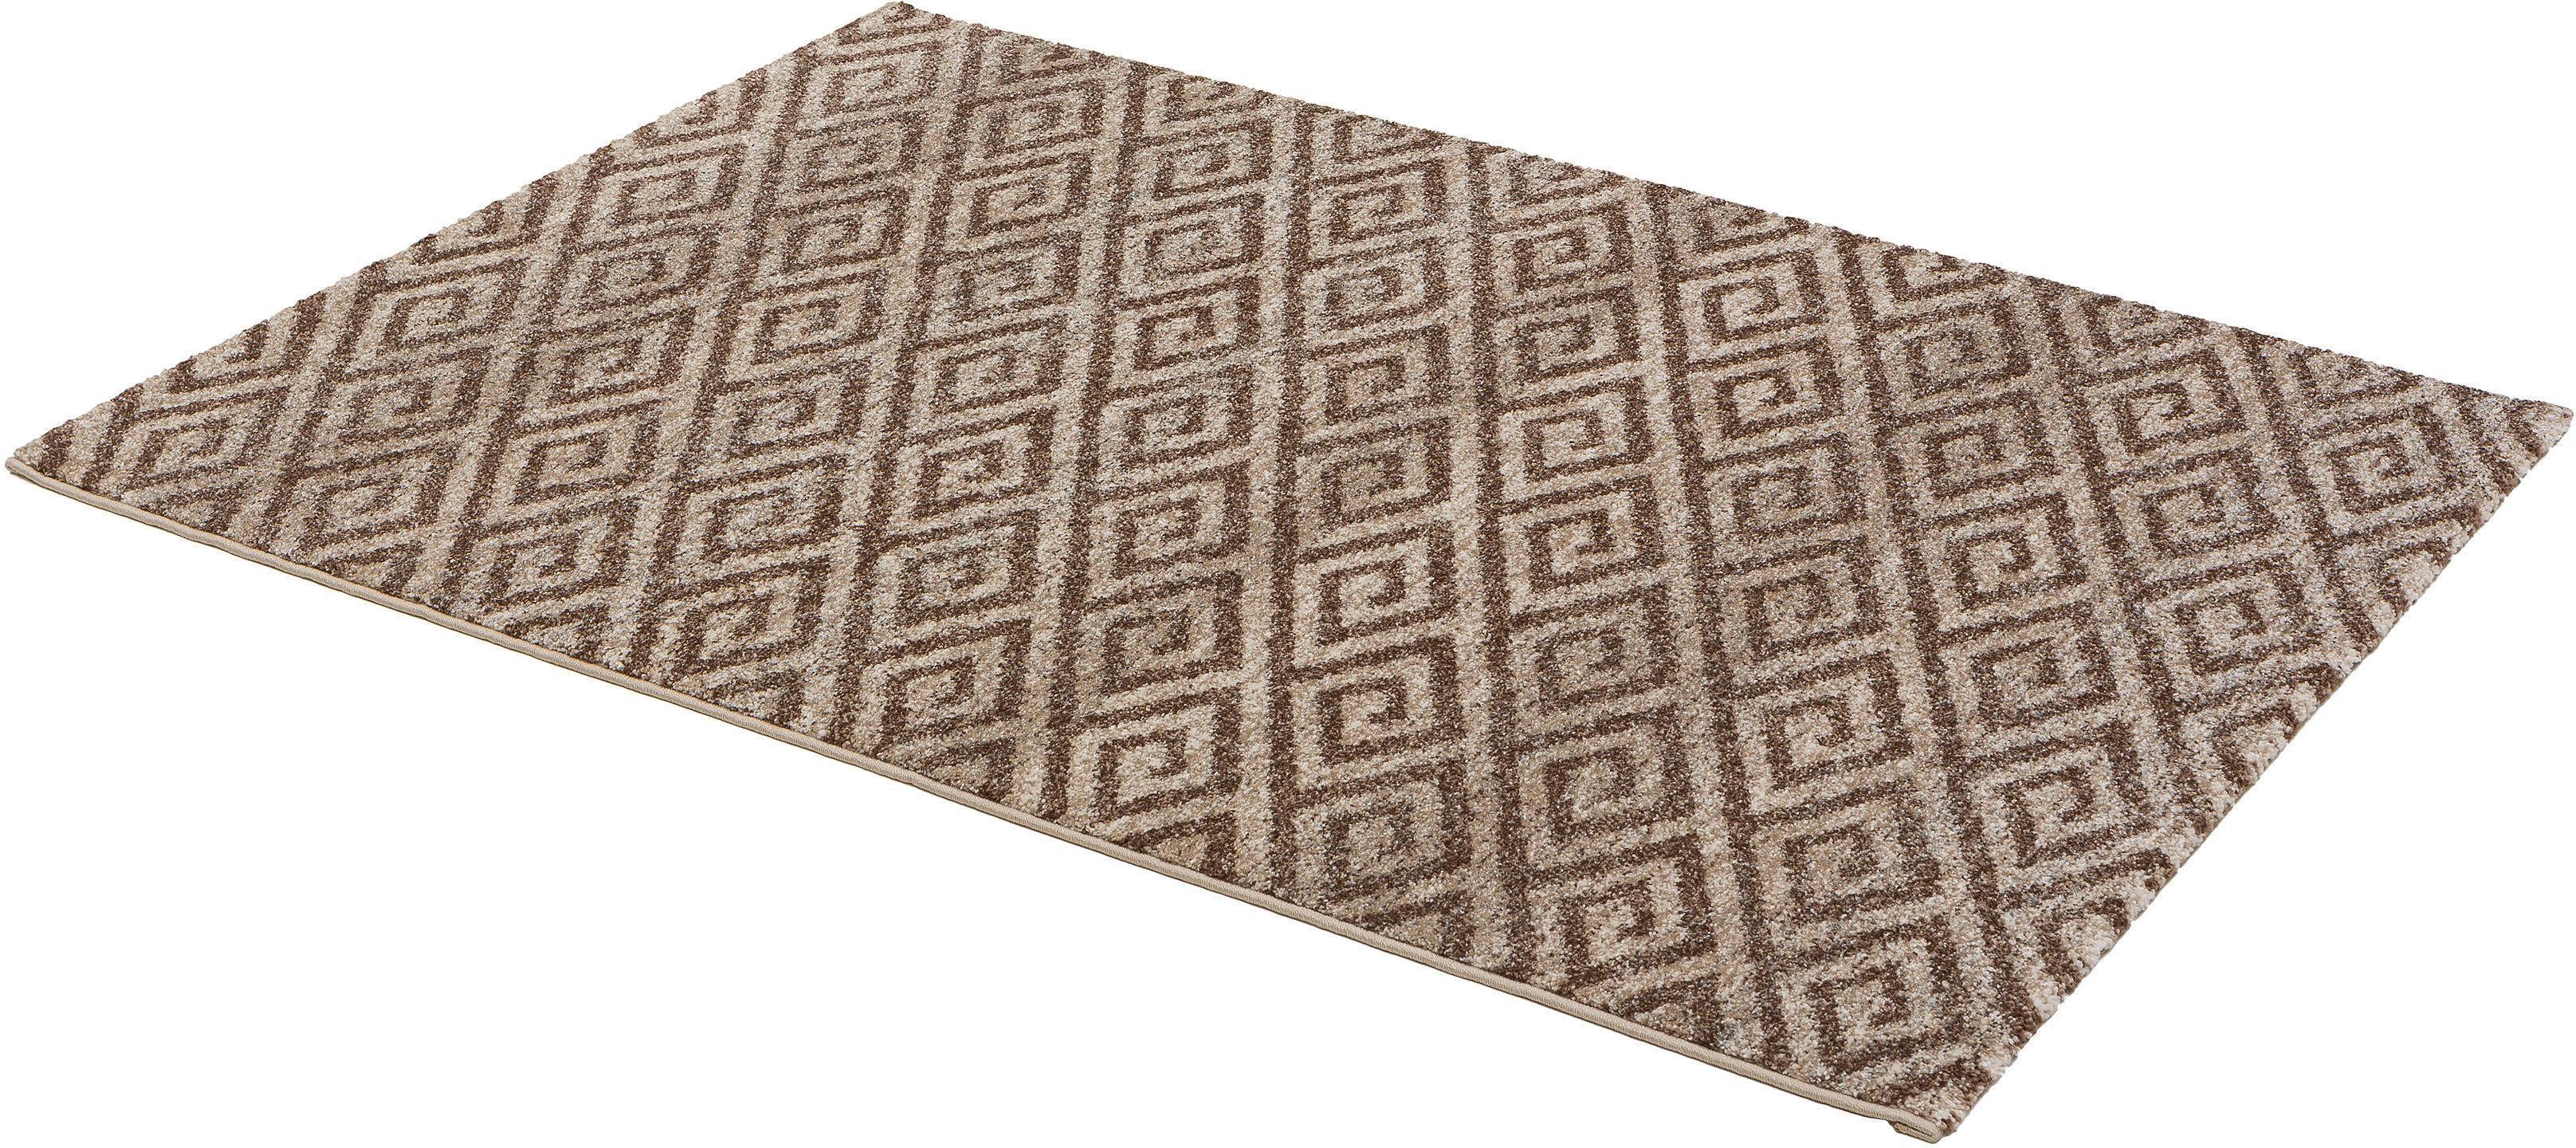 Teppich Carpi Raute ASTRA rechteckig Höhe 15 mm